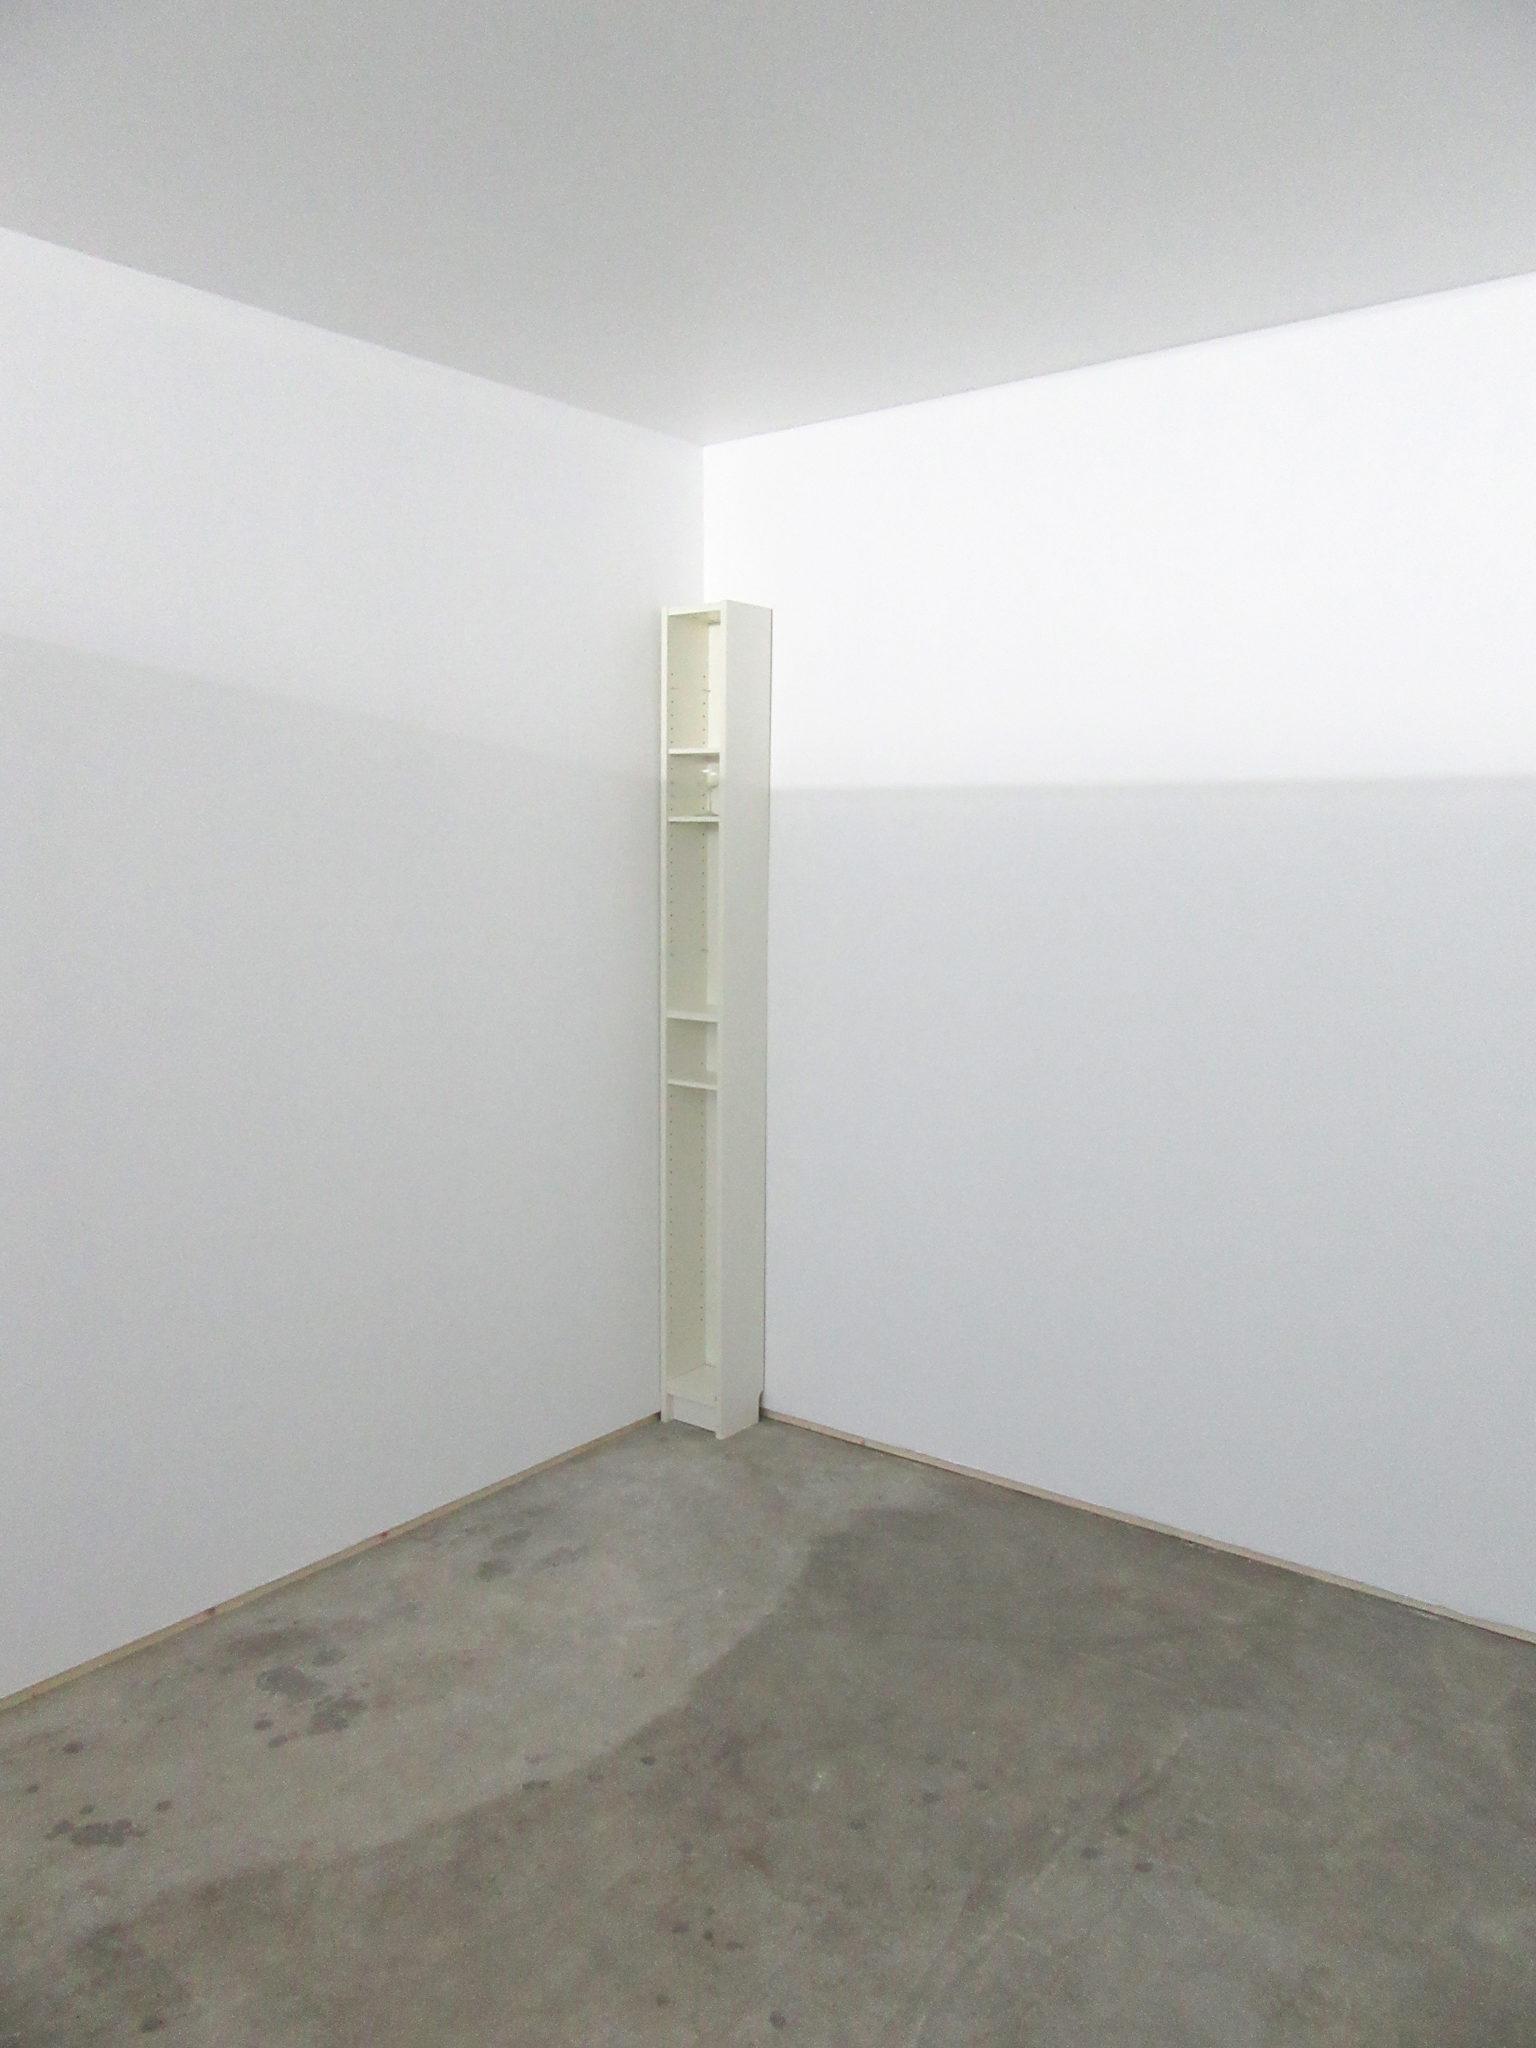 sannahelenaberger-theedgemustbescalloped-diorama-11